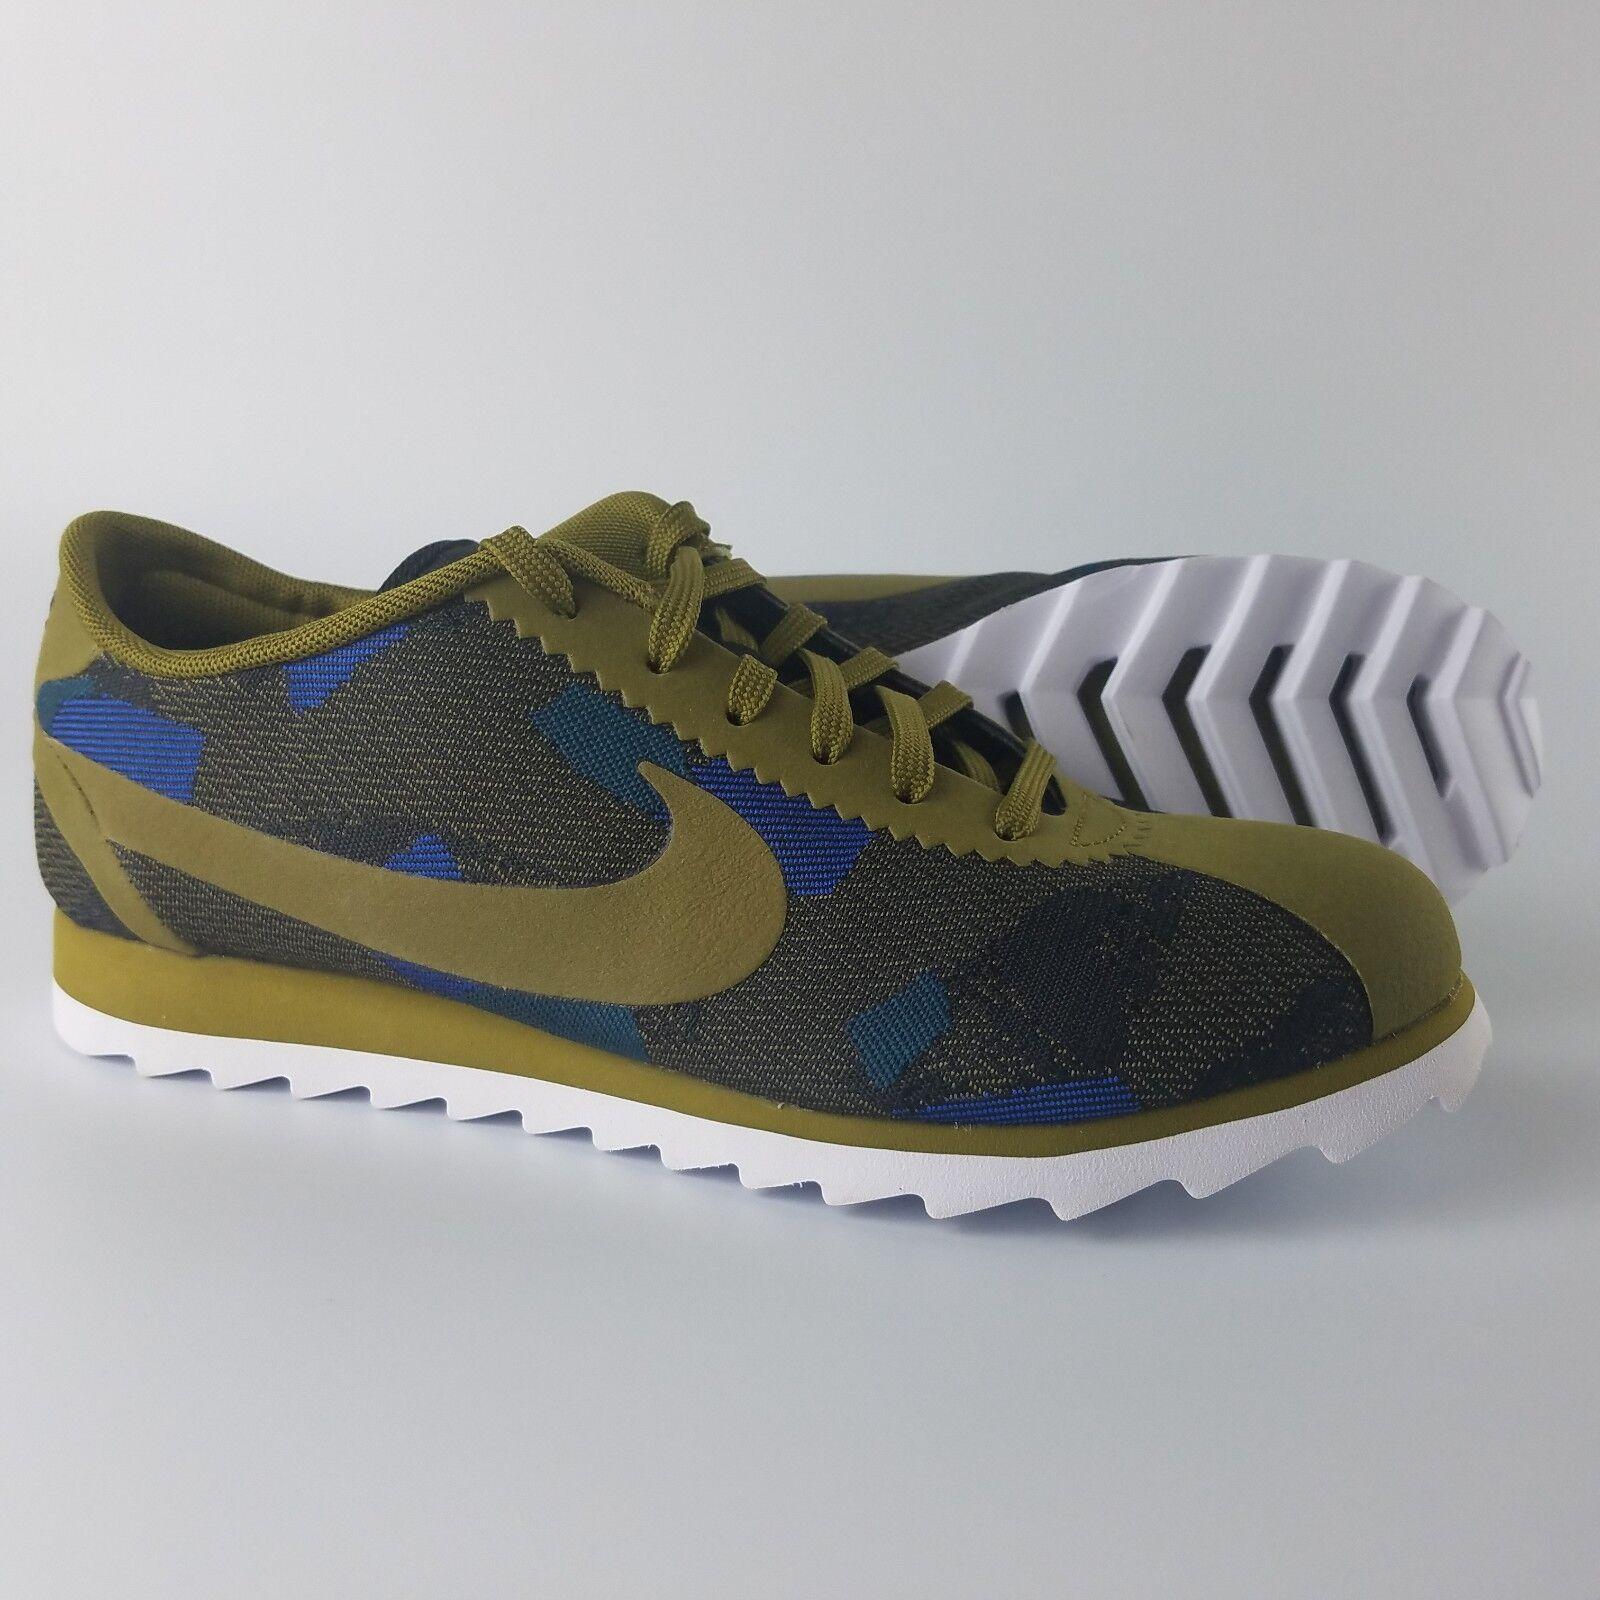 Nike Cortez Ultra Print Print Print Running shoes Women's Size 6 Olive Flak bluee 844894-300 6fe5ae